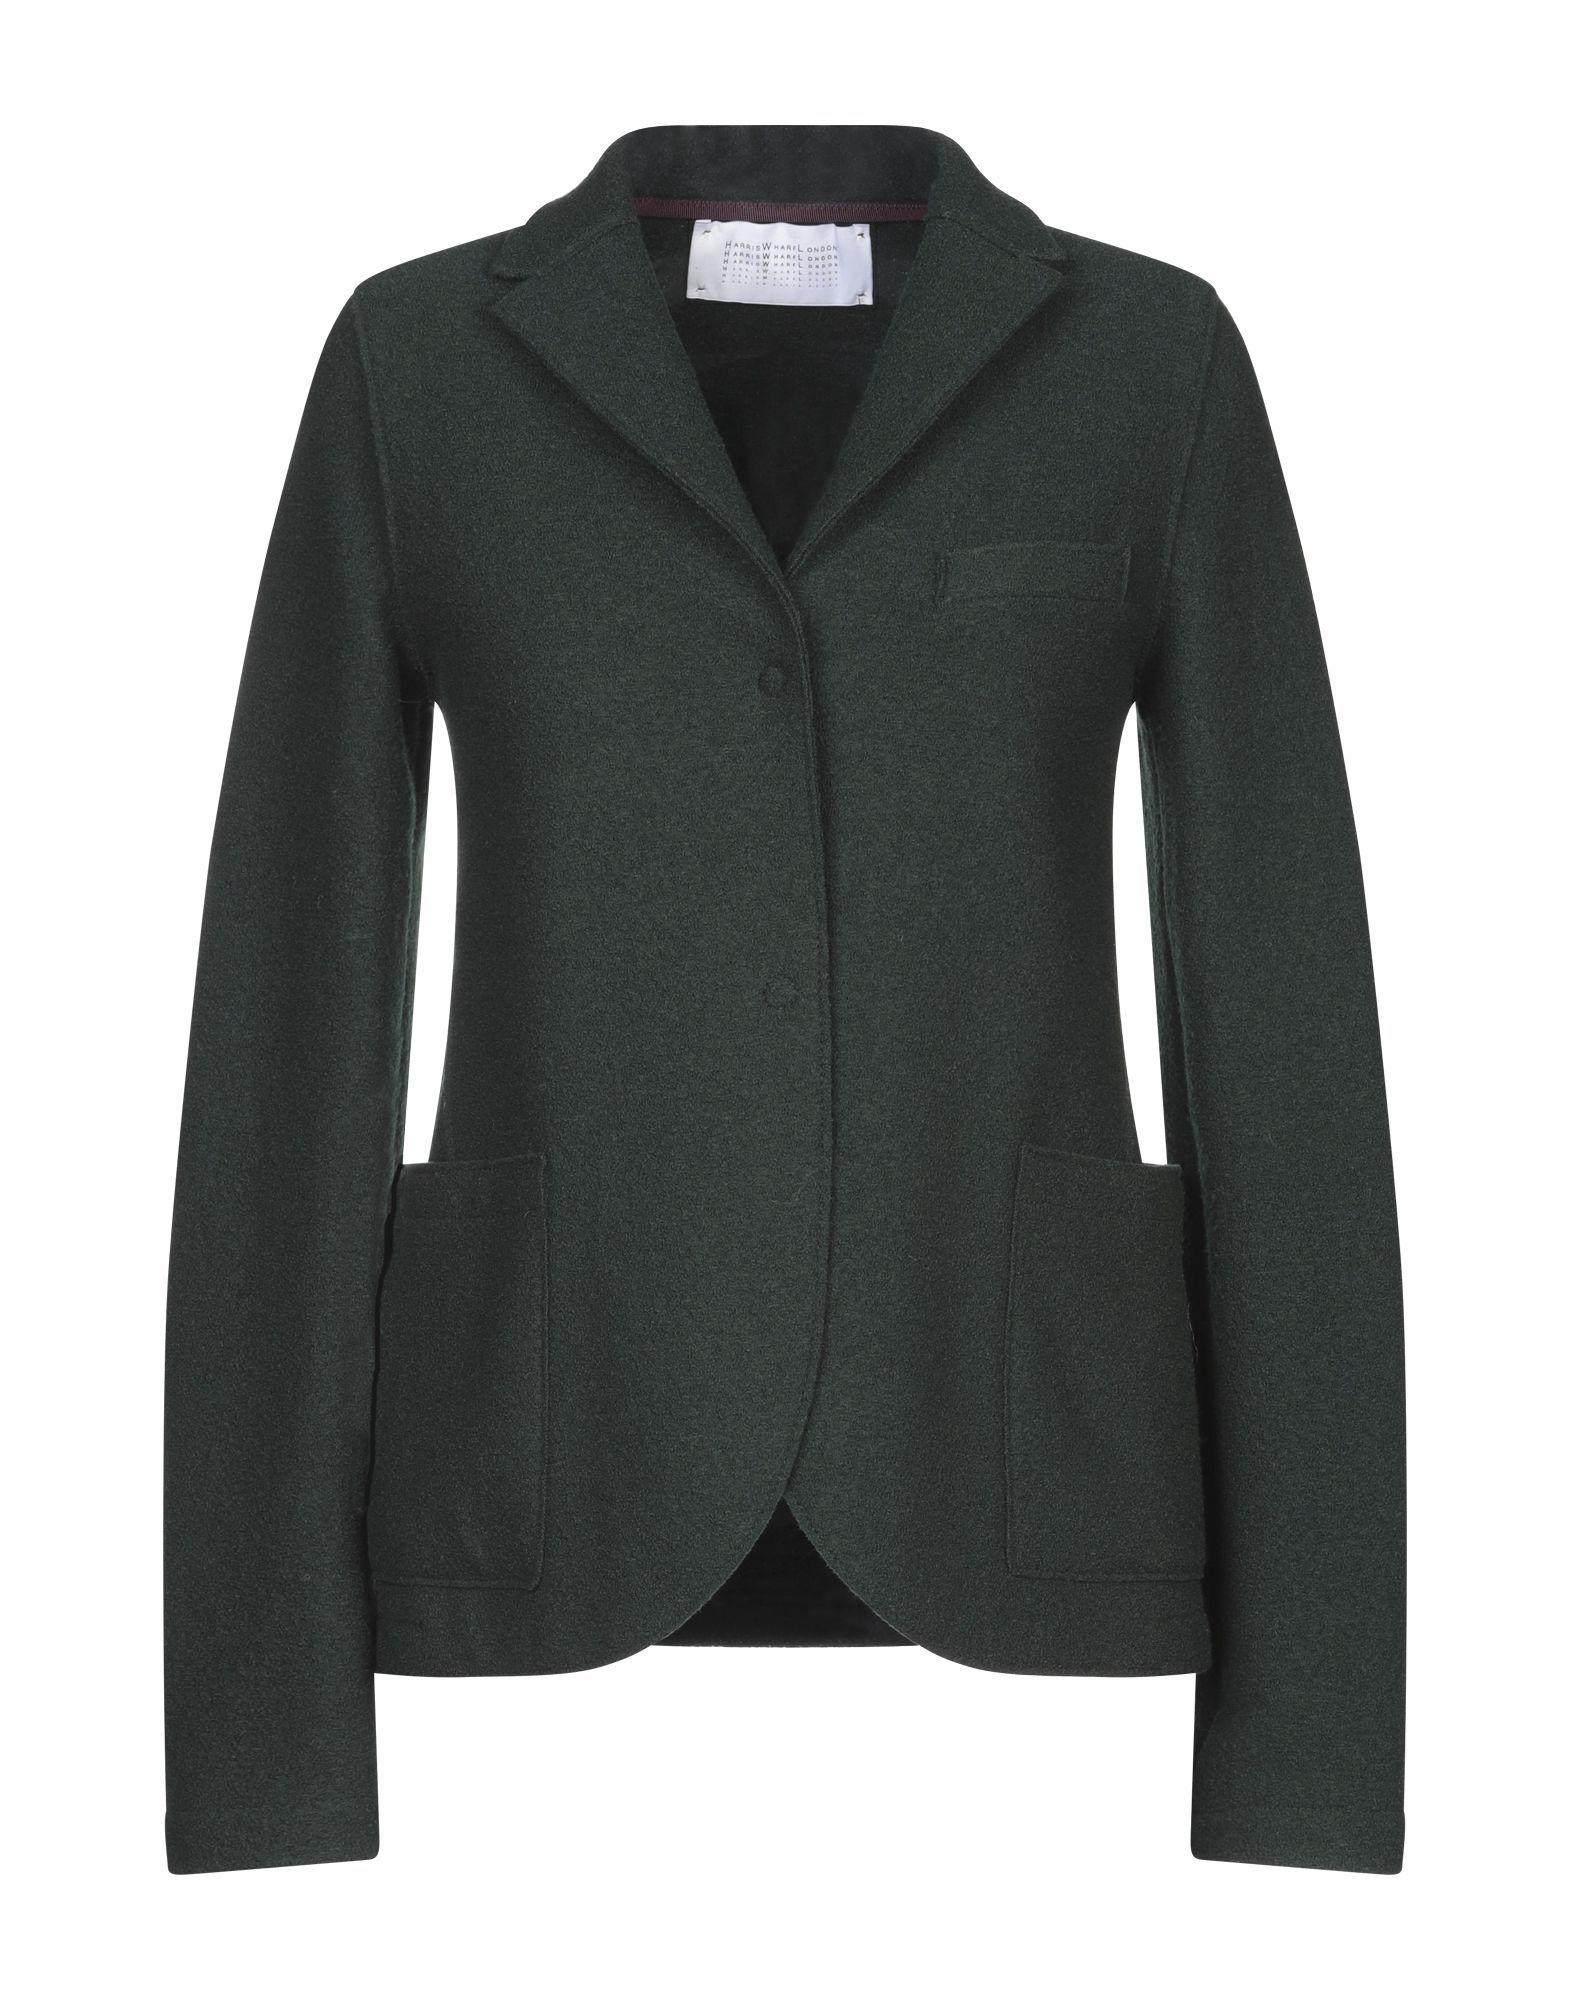 Harris Wharf London Dark Green Virgin Wool Jacket